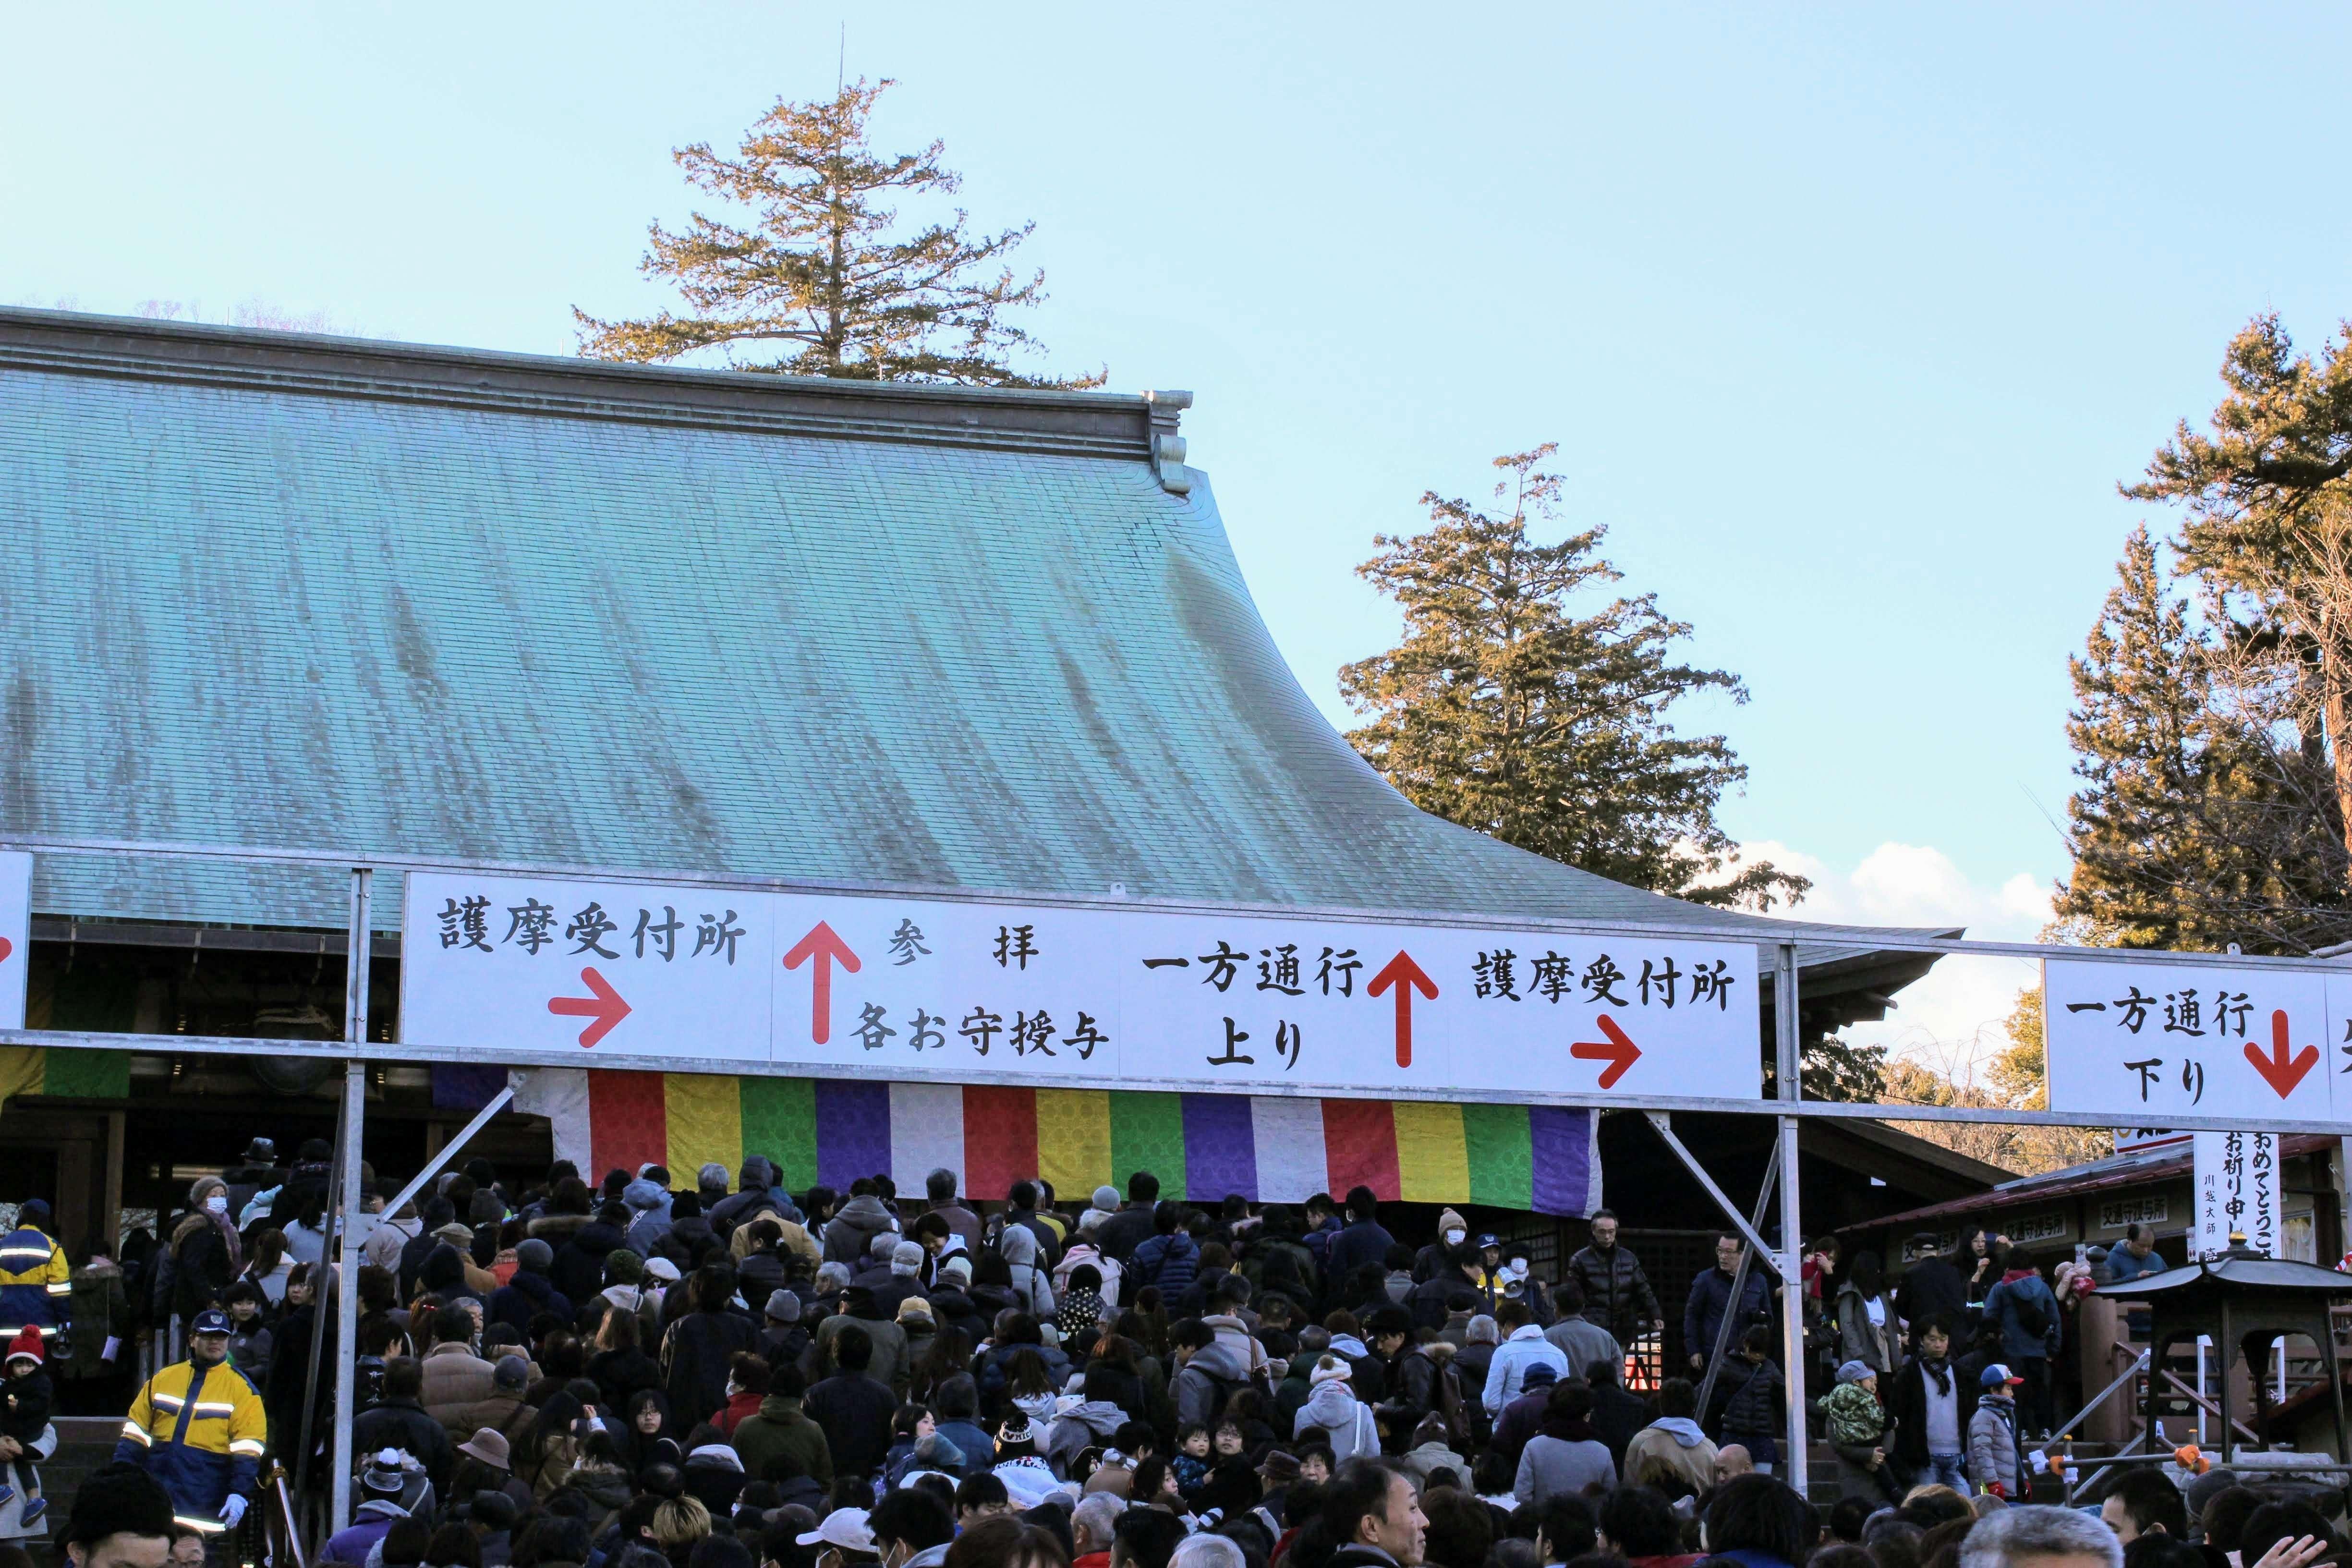 hatsumode saitama kitain hatsumode Japanese new year tradition